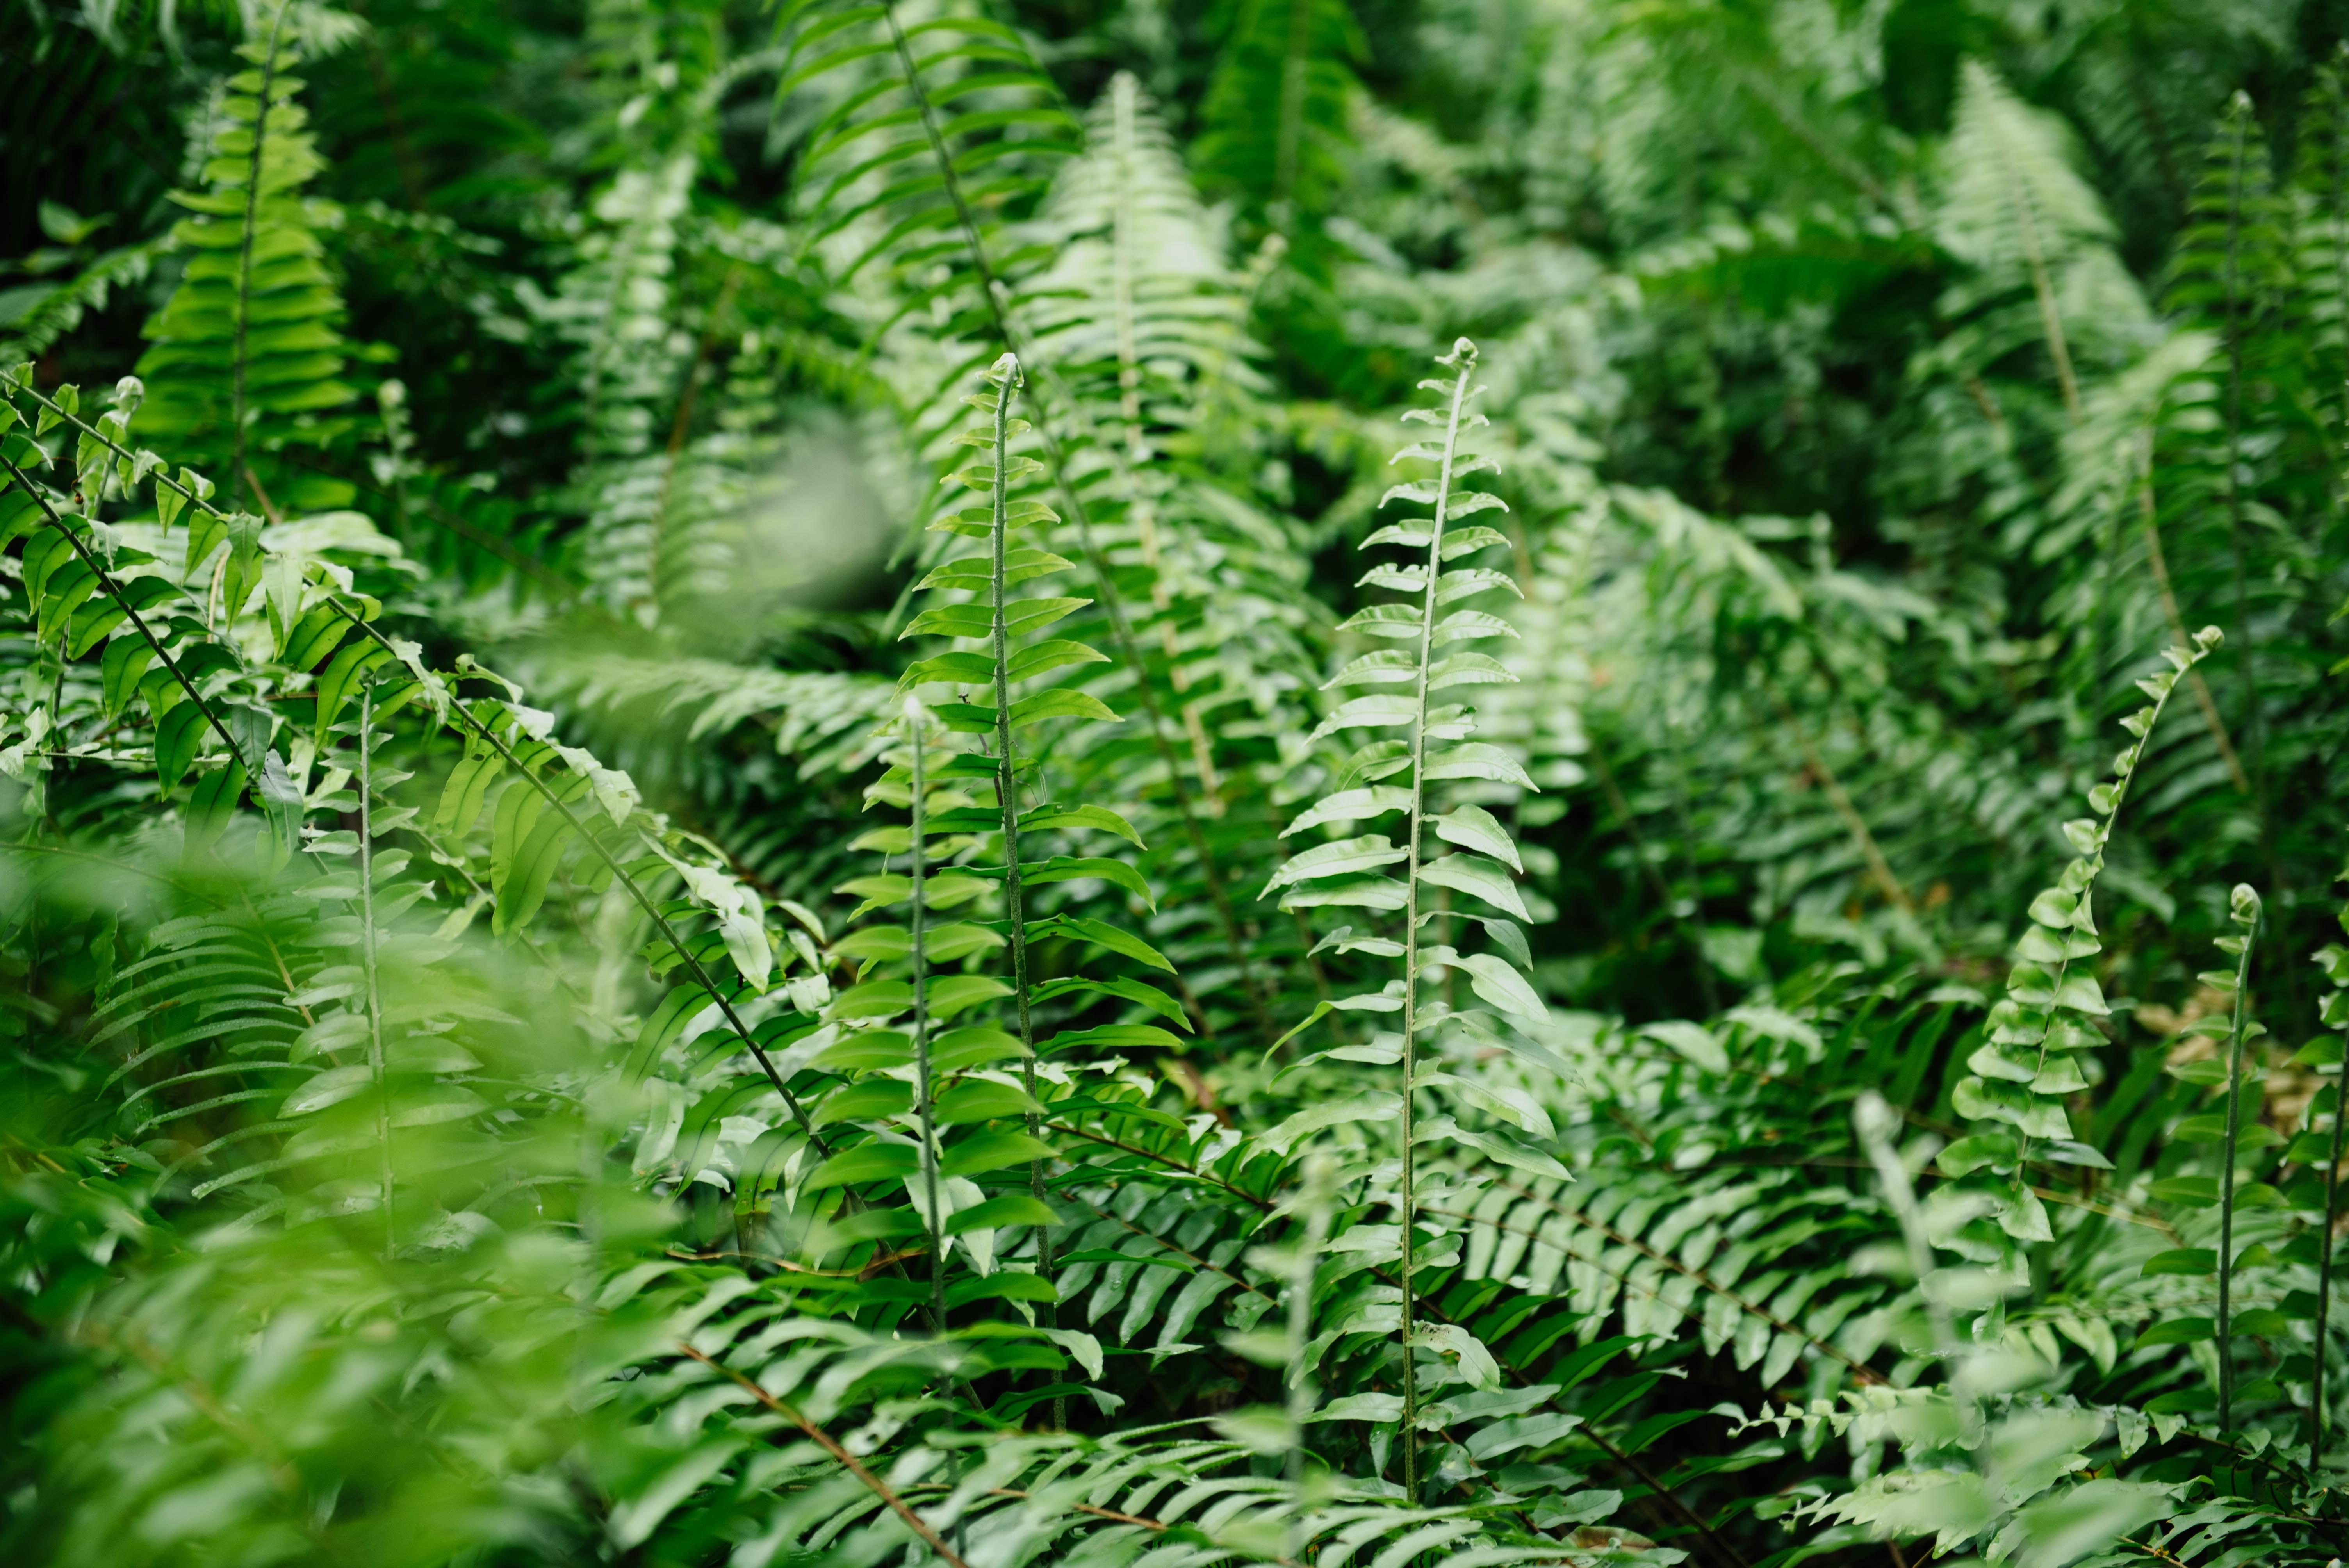 green ferns close up photography